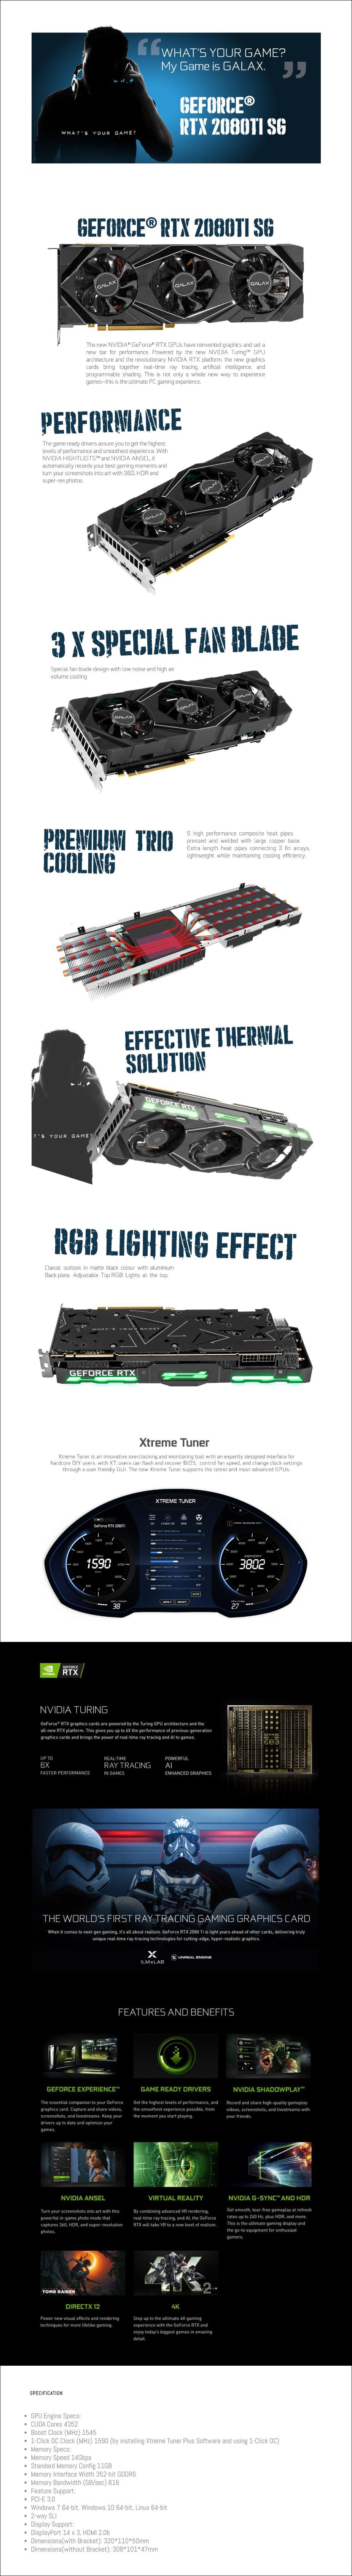 GALAX GeForce RTX 2080 Ti SG 1-Clock OC v2 11GB Video Card - Overview 1